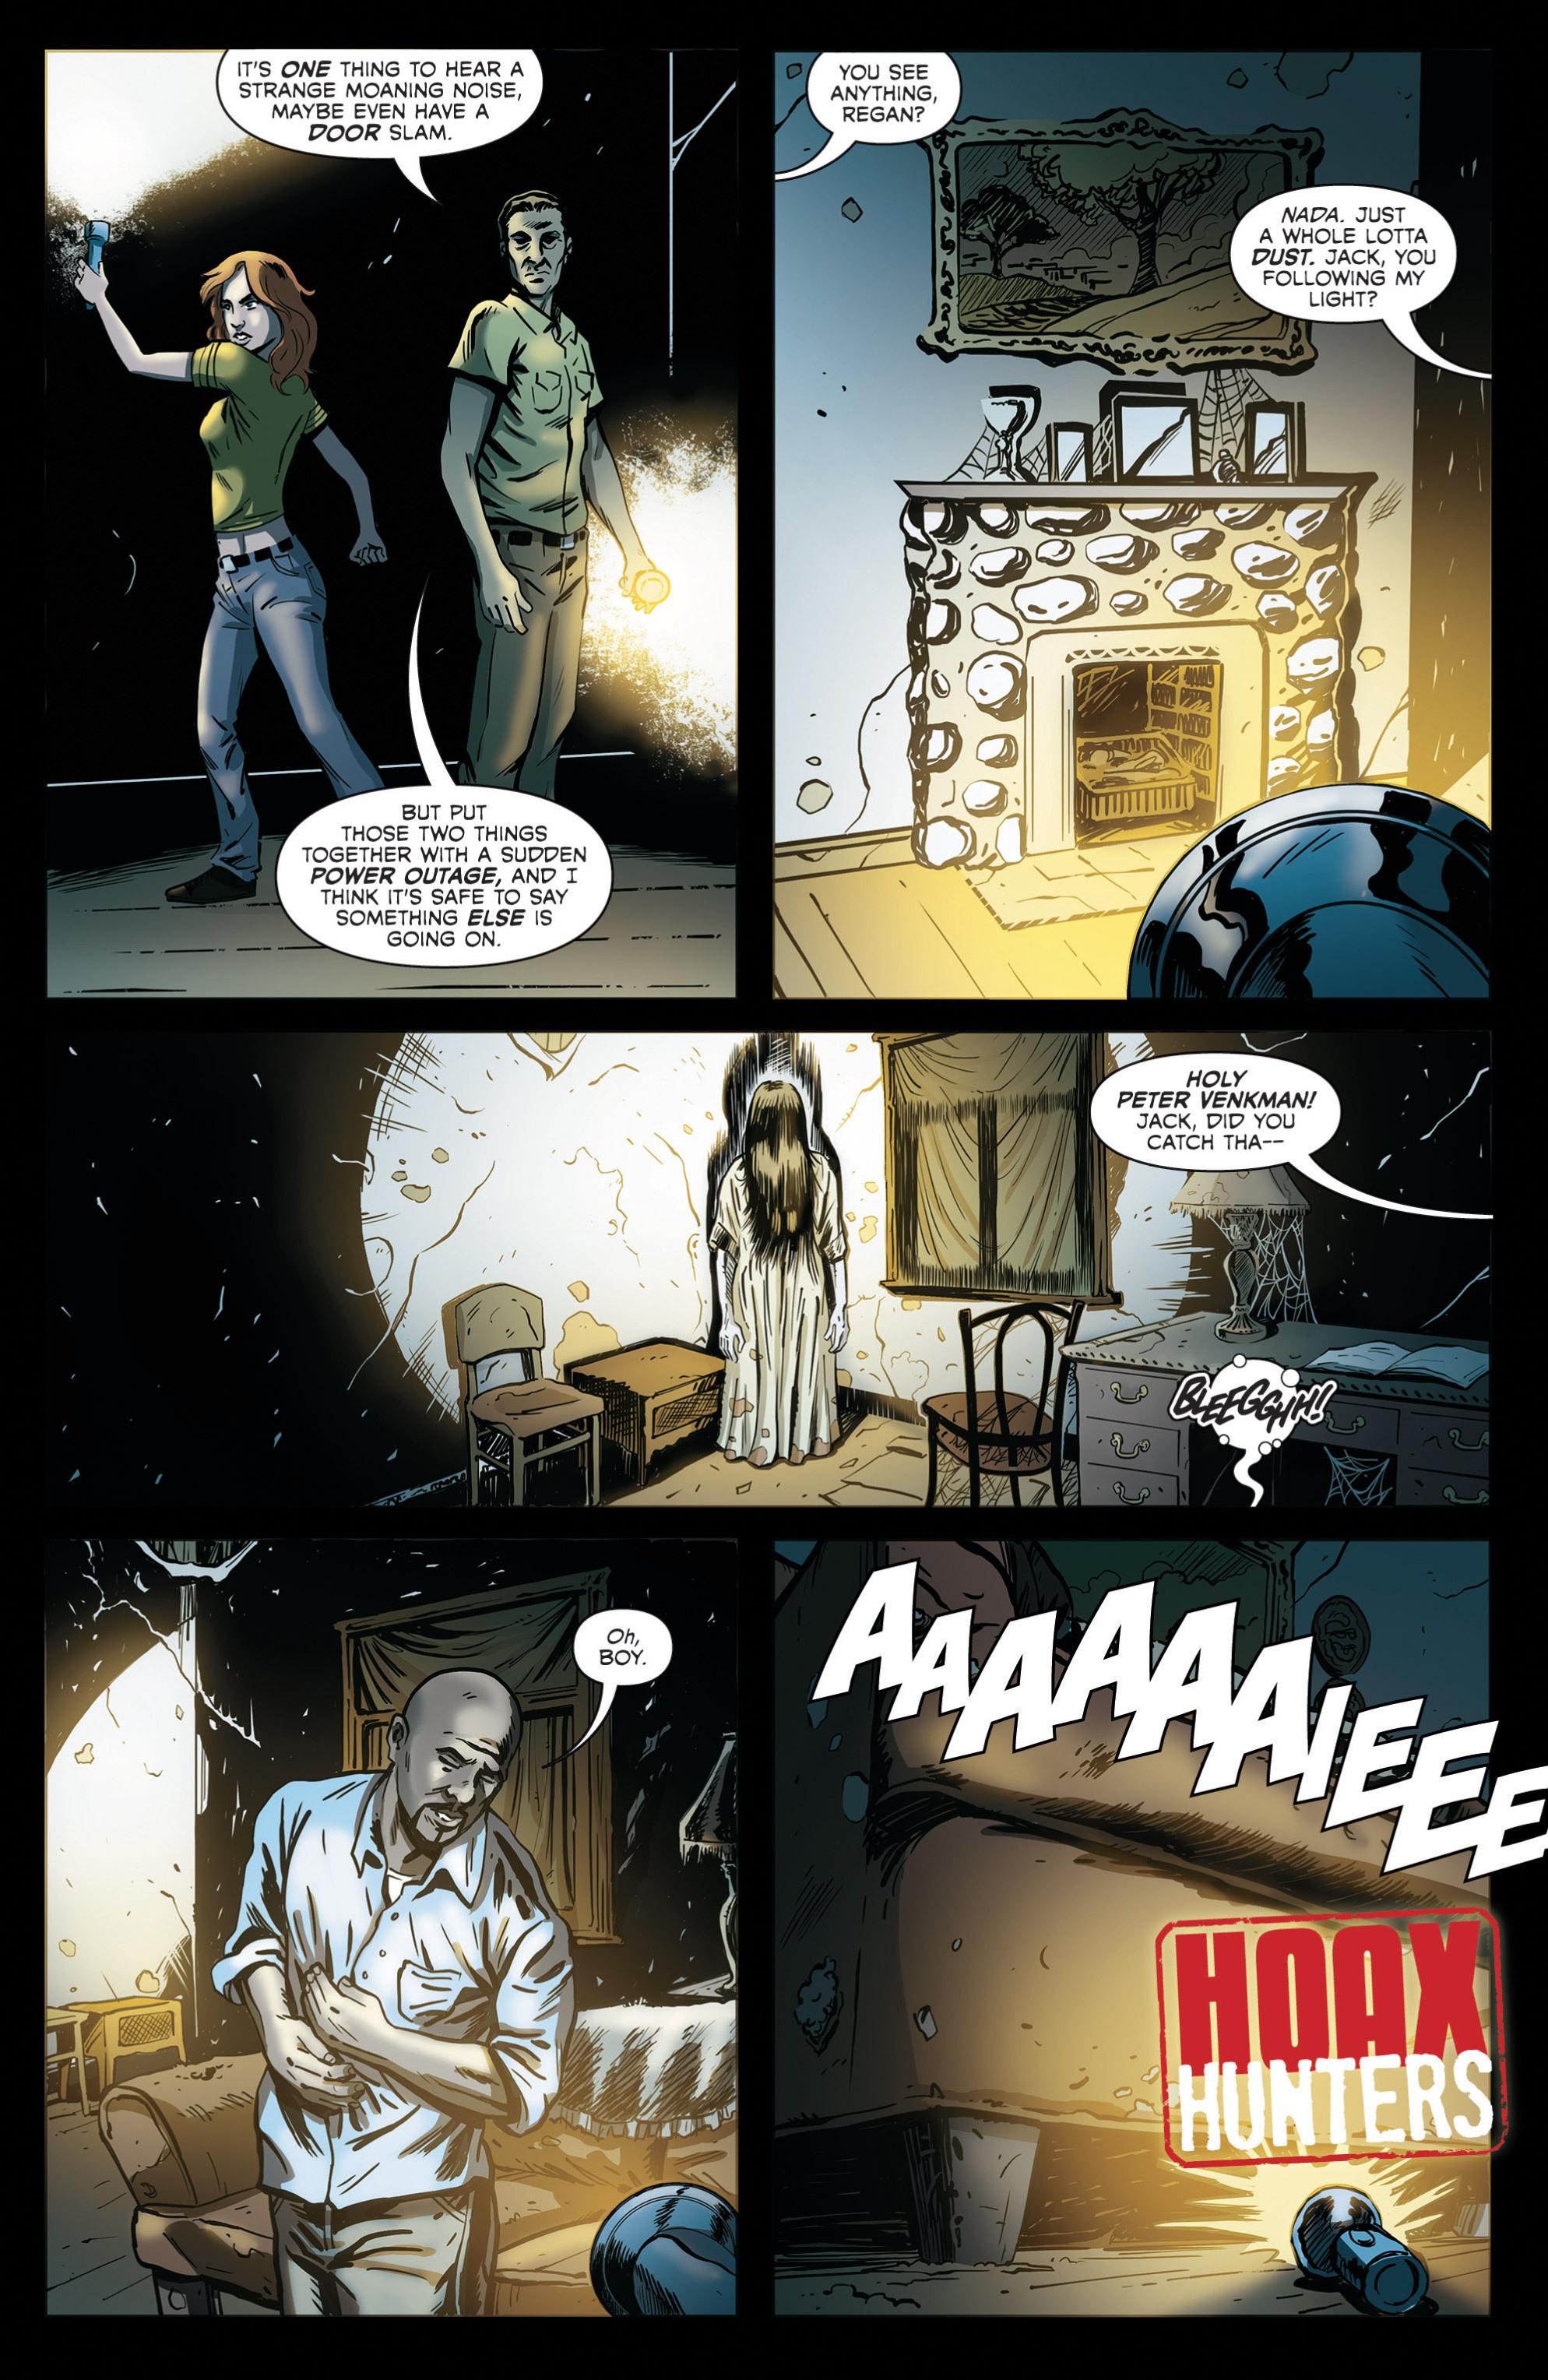 Read online Hoax Hunters (2012) comic -  Issue # TPB 2 - 79